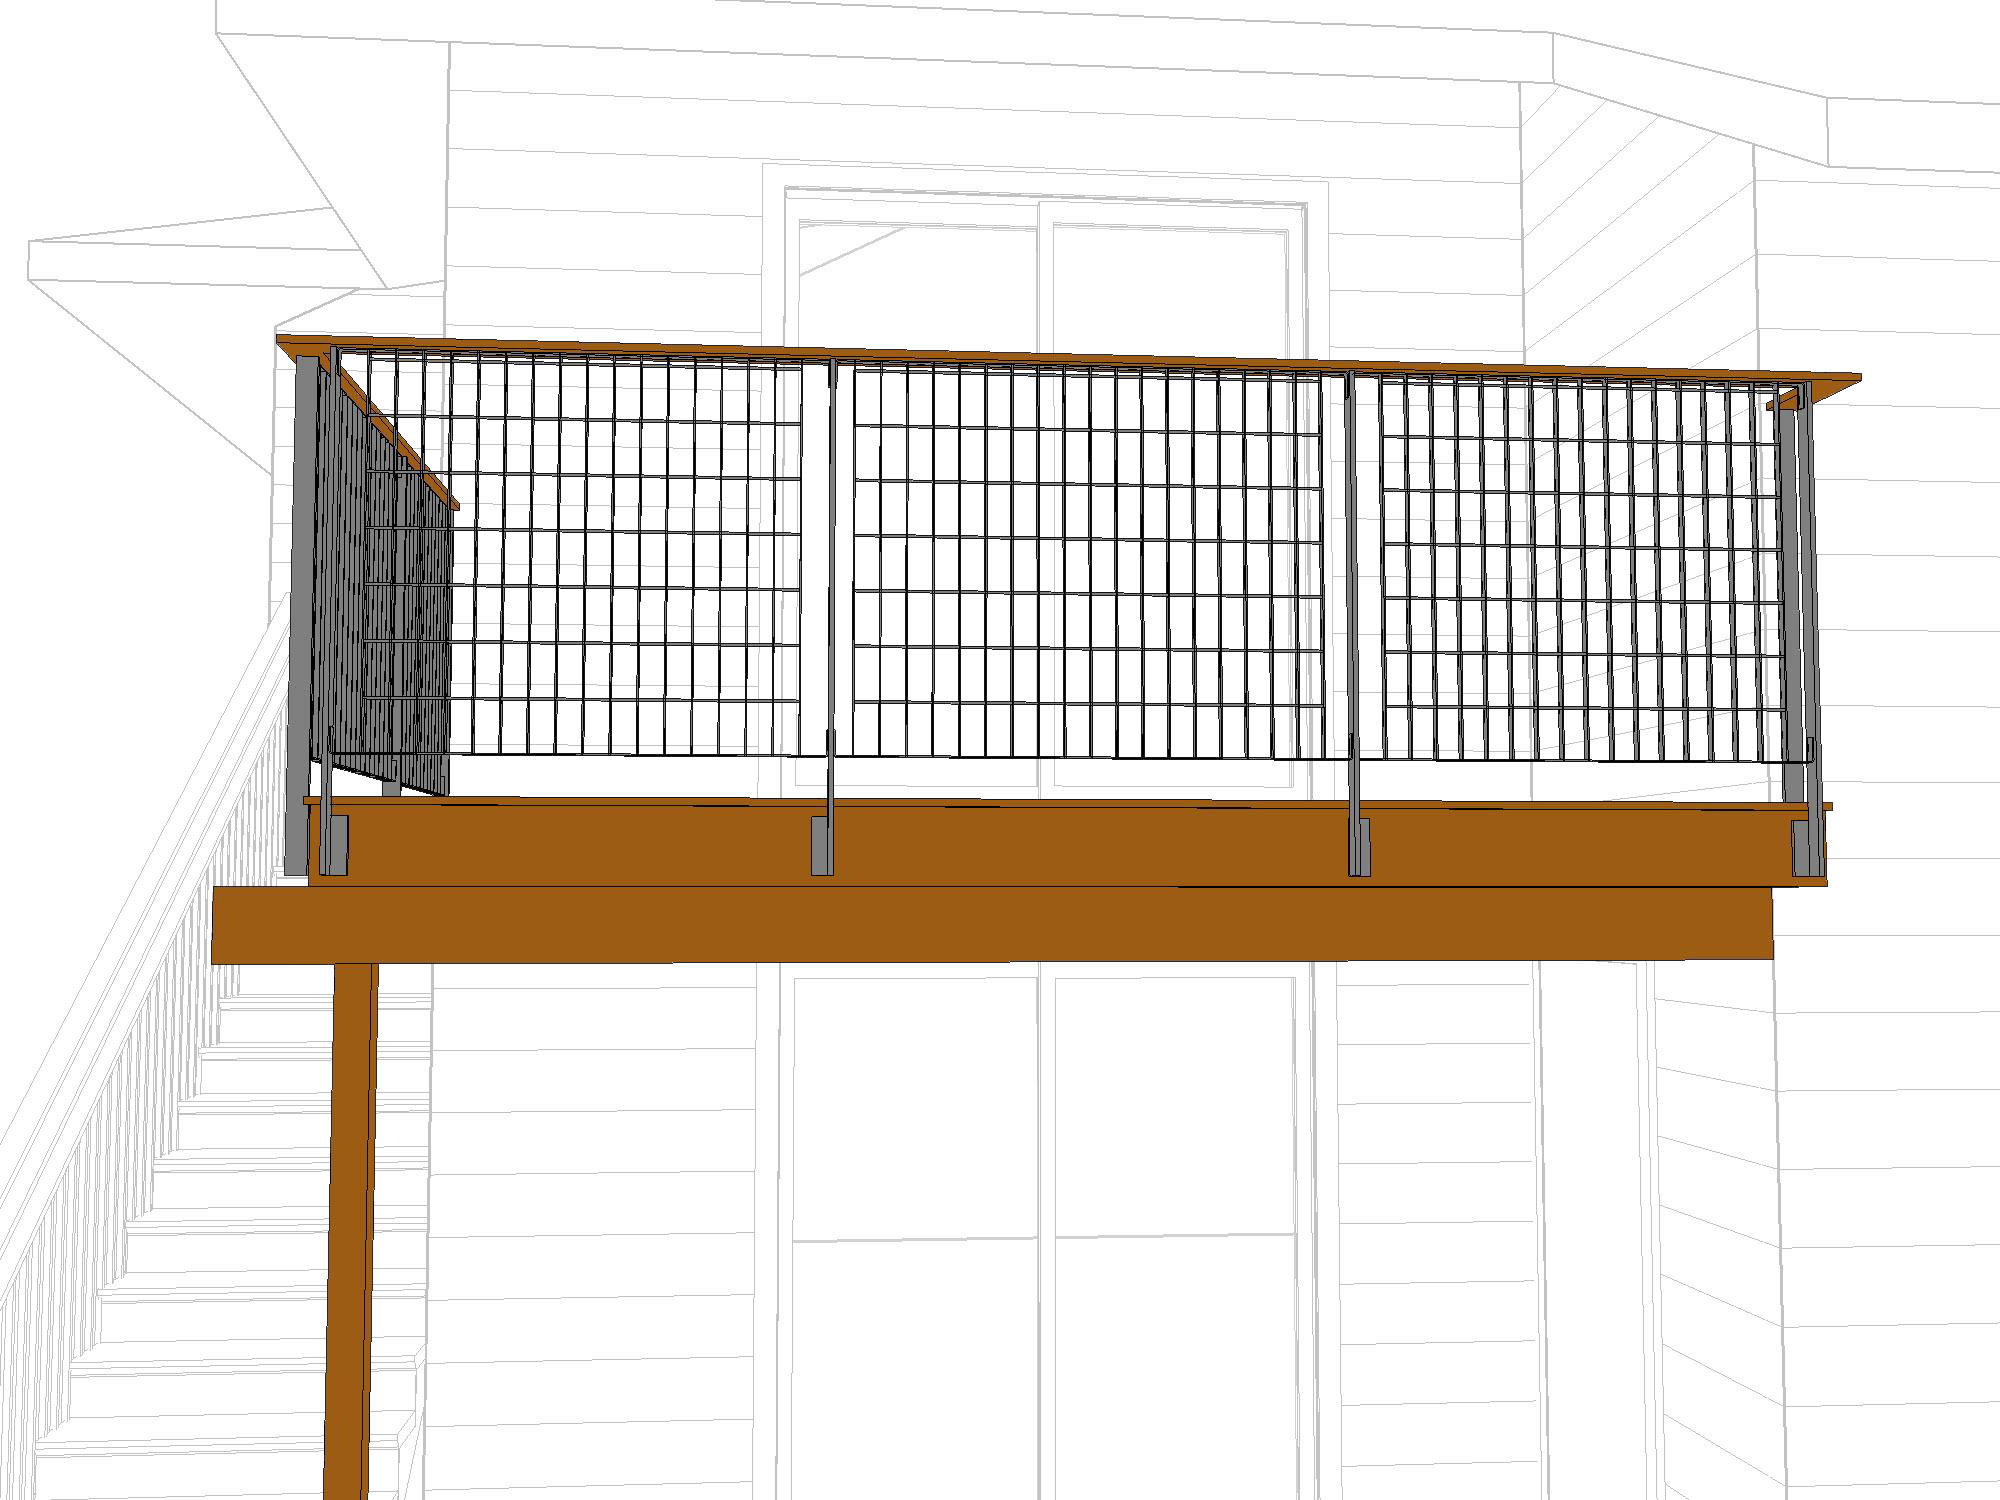 Courtside railing2.jpg